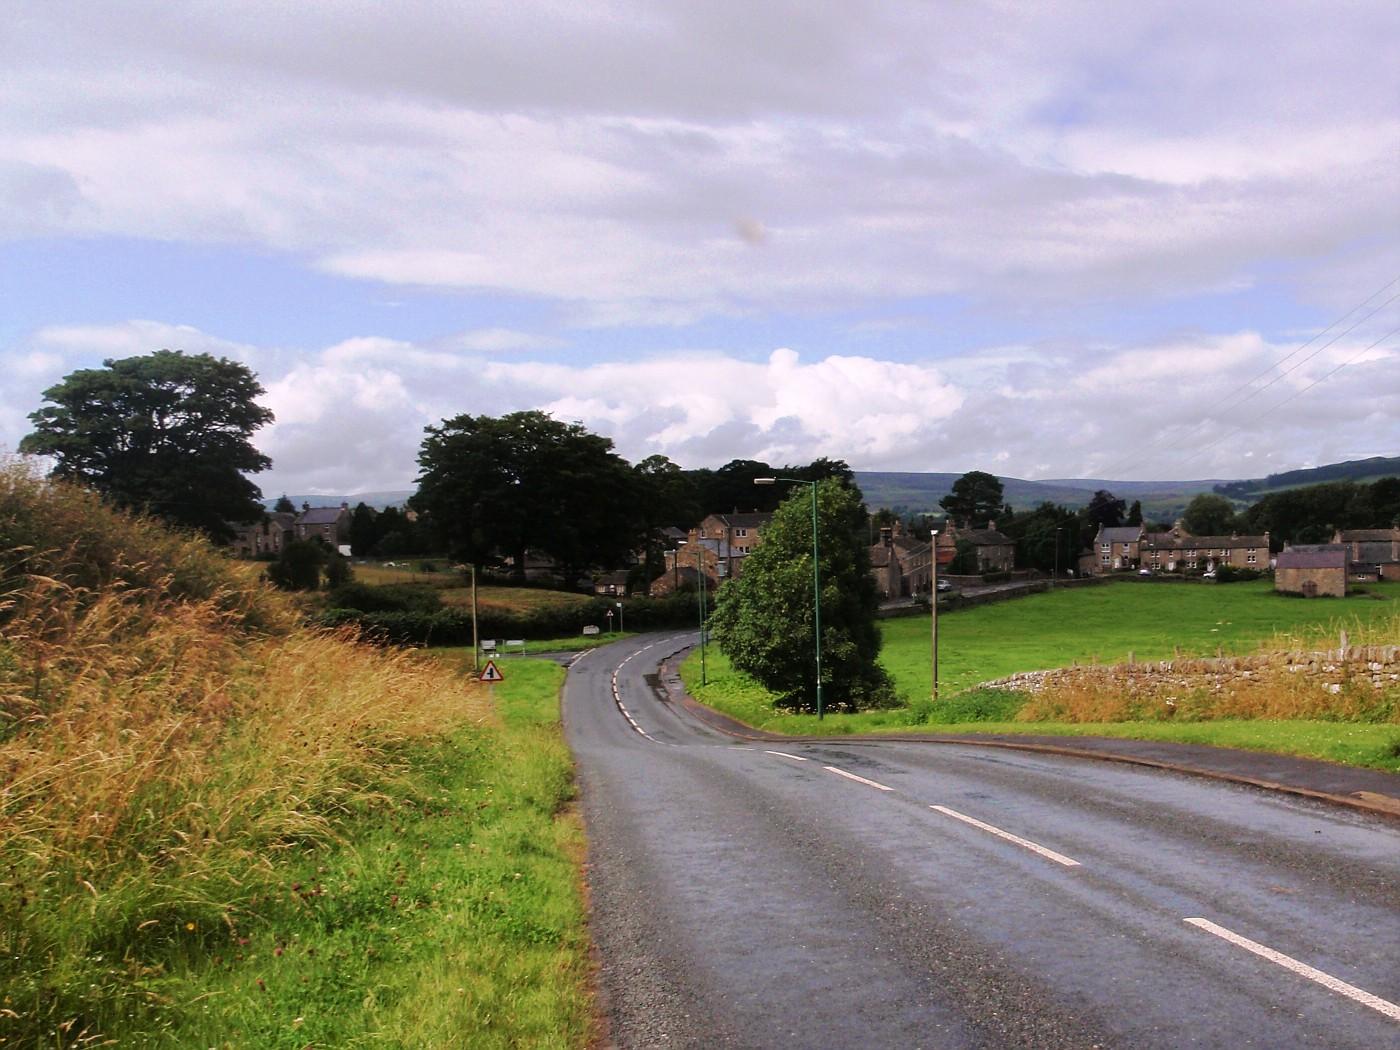 Landscape of Cumbria, England